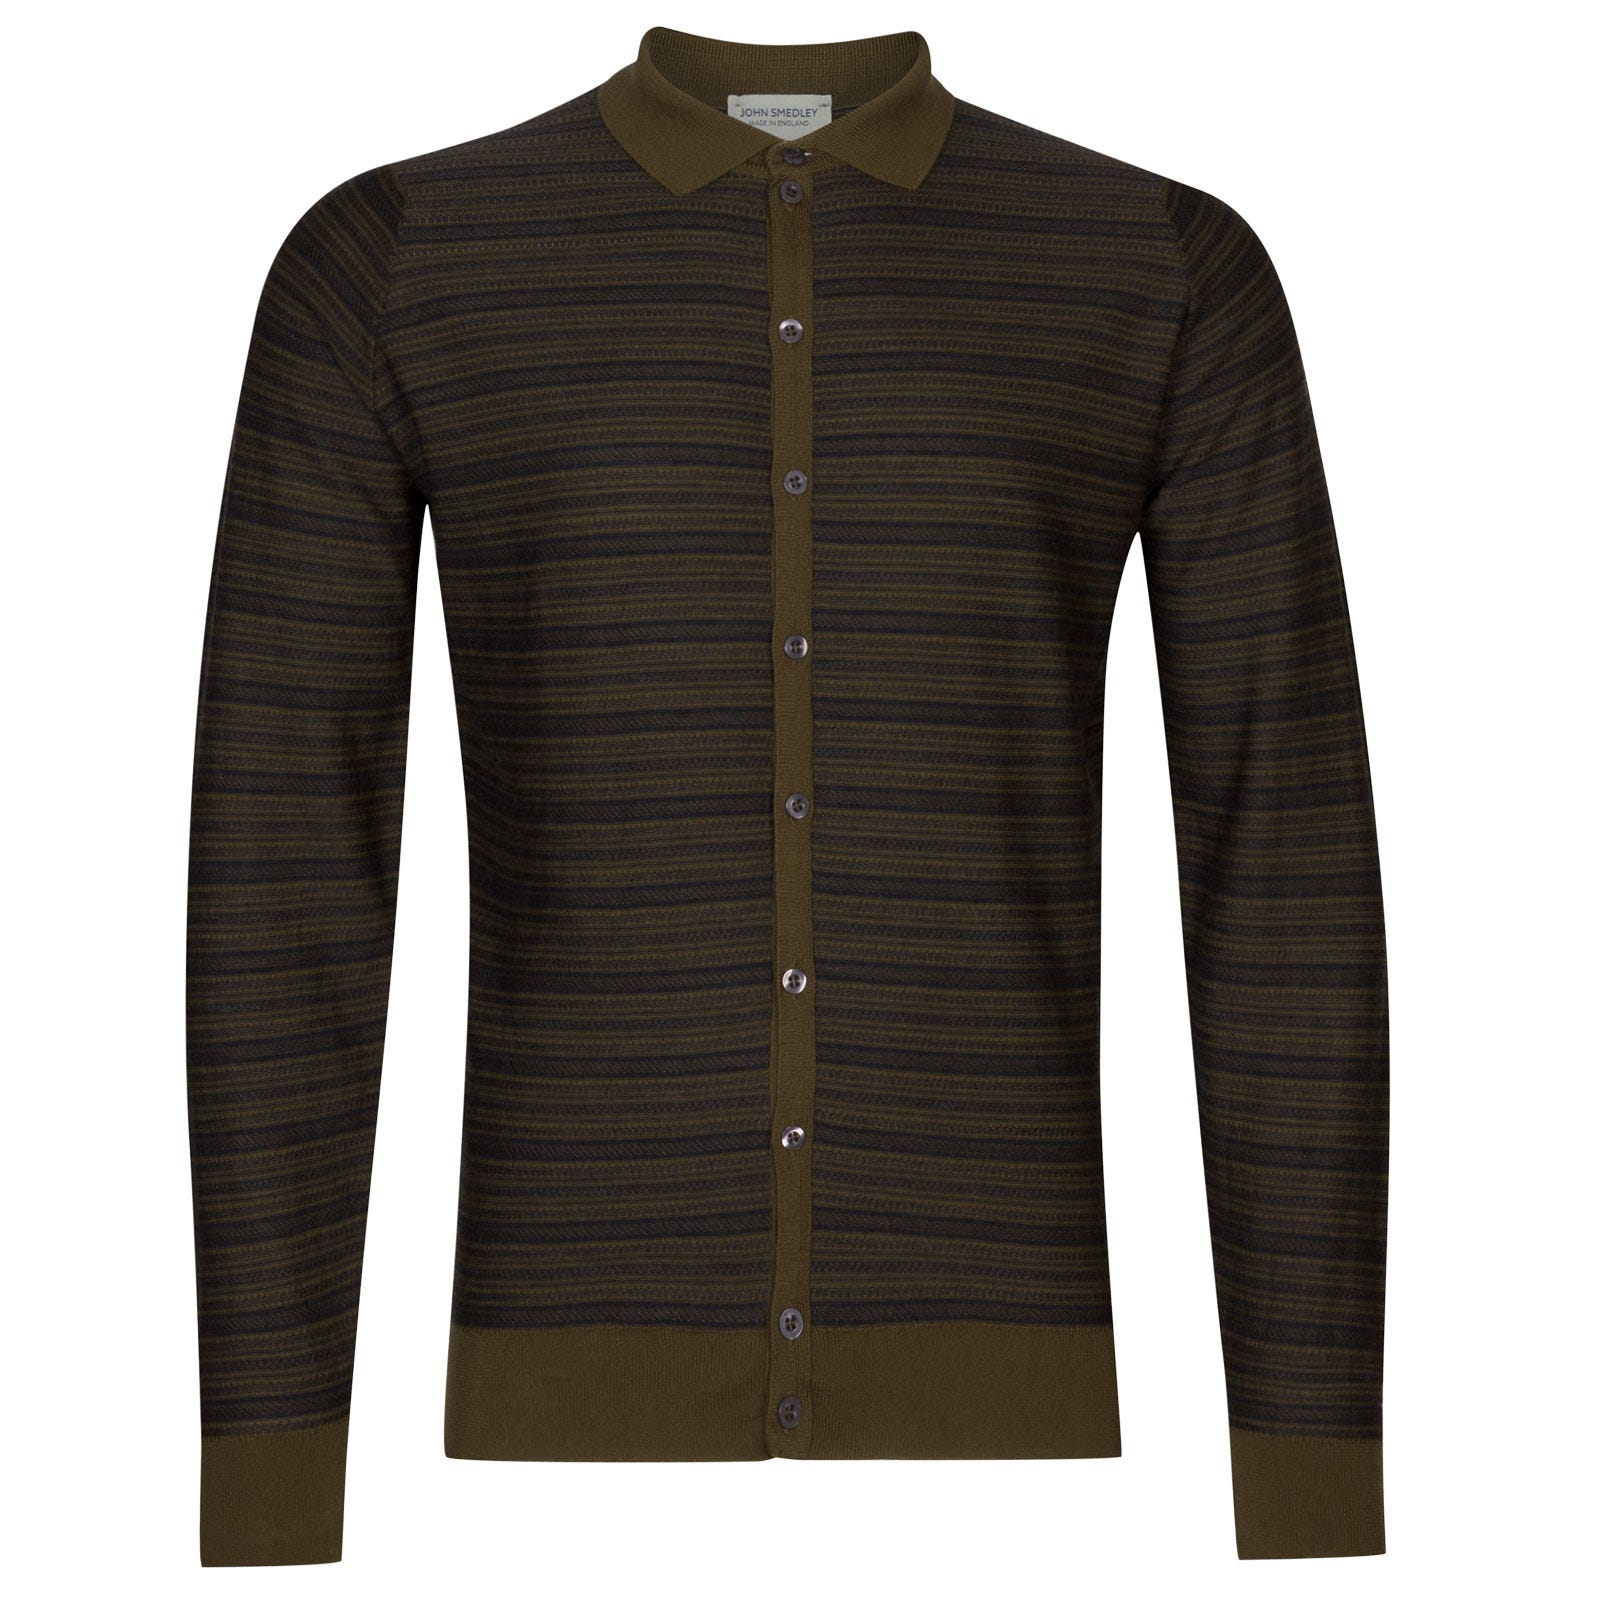 John Smedley hemlock Merino Wool Shirt in Hepburn Smoke/Kielder